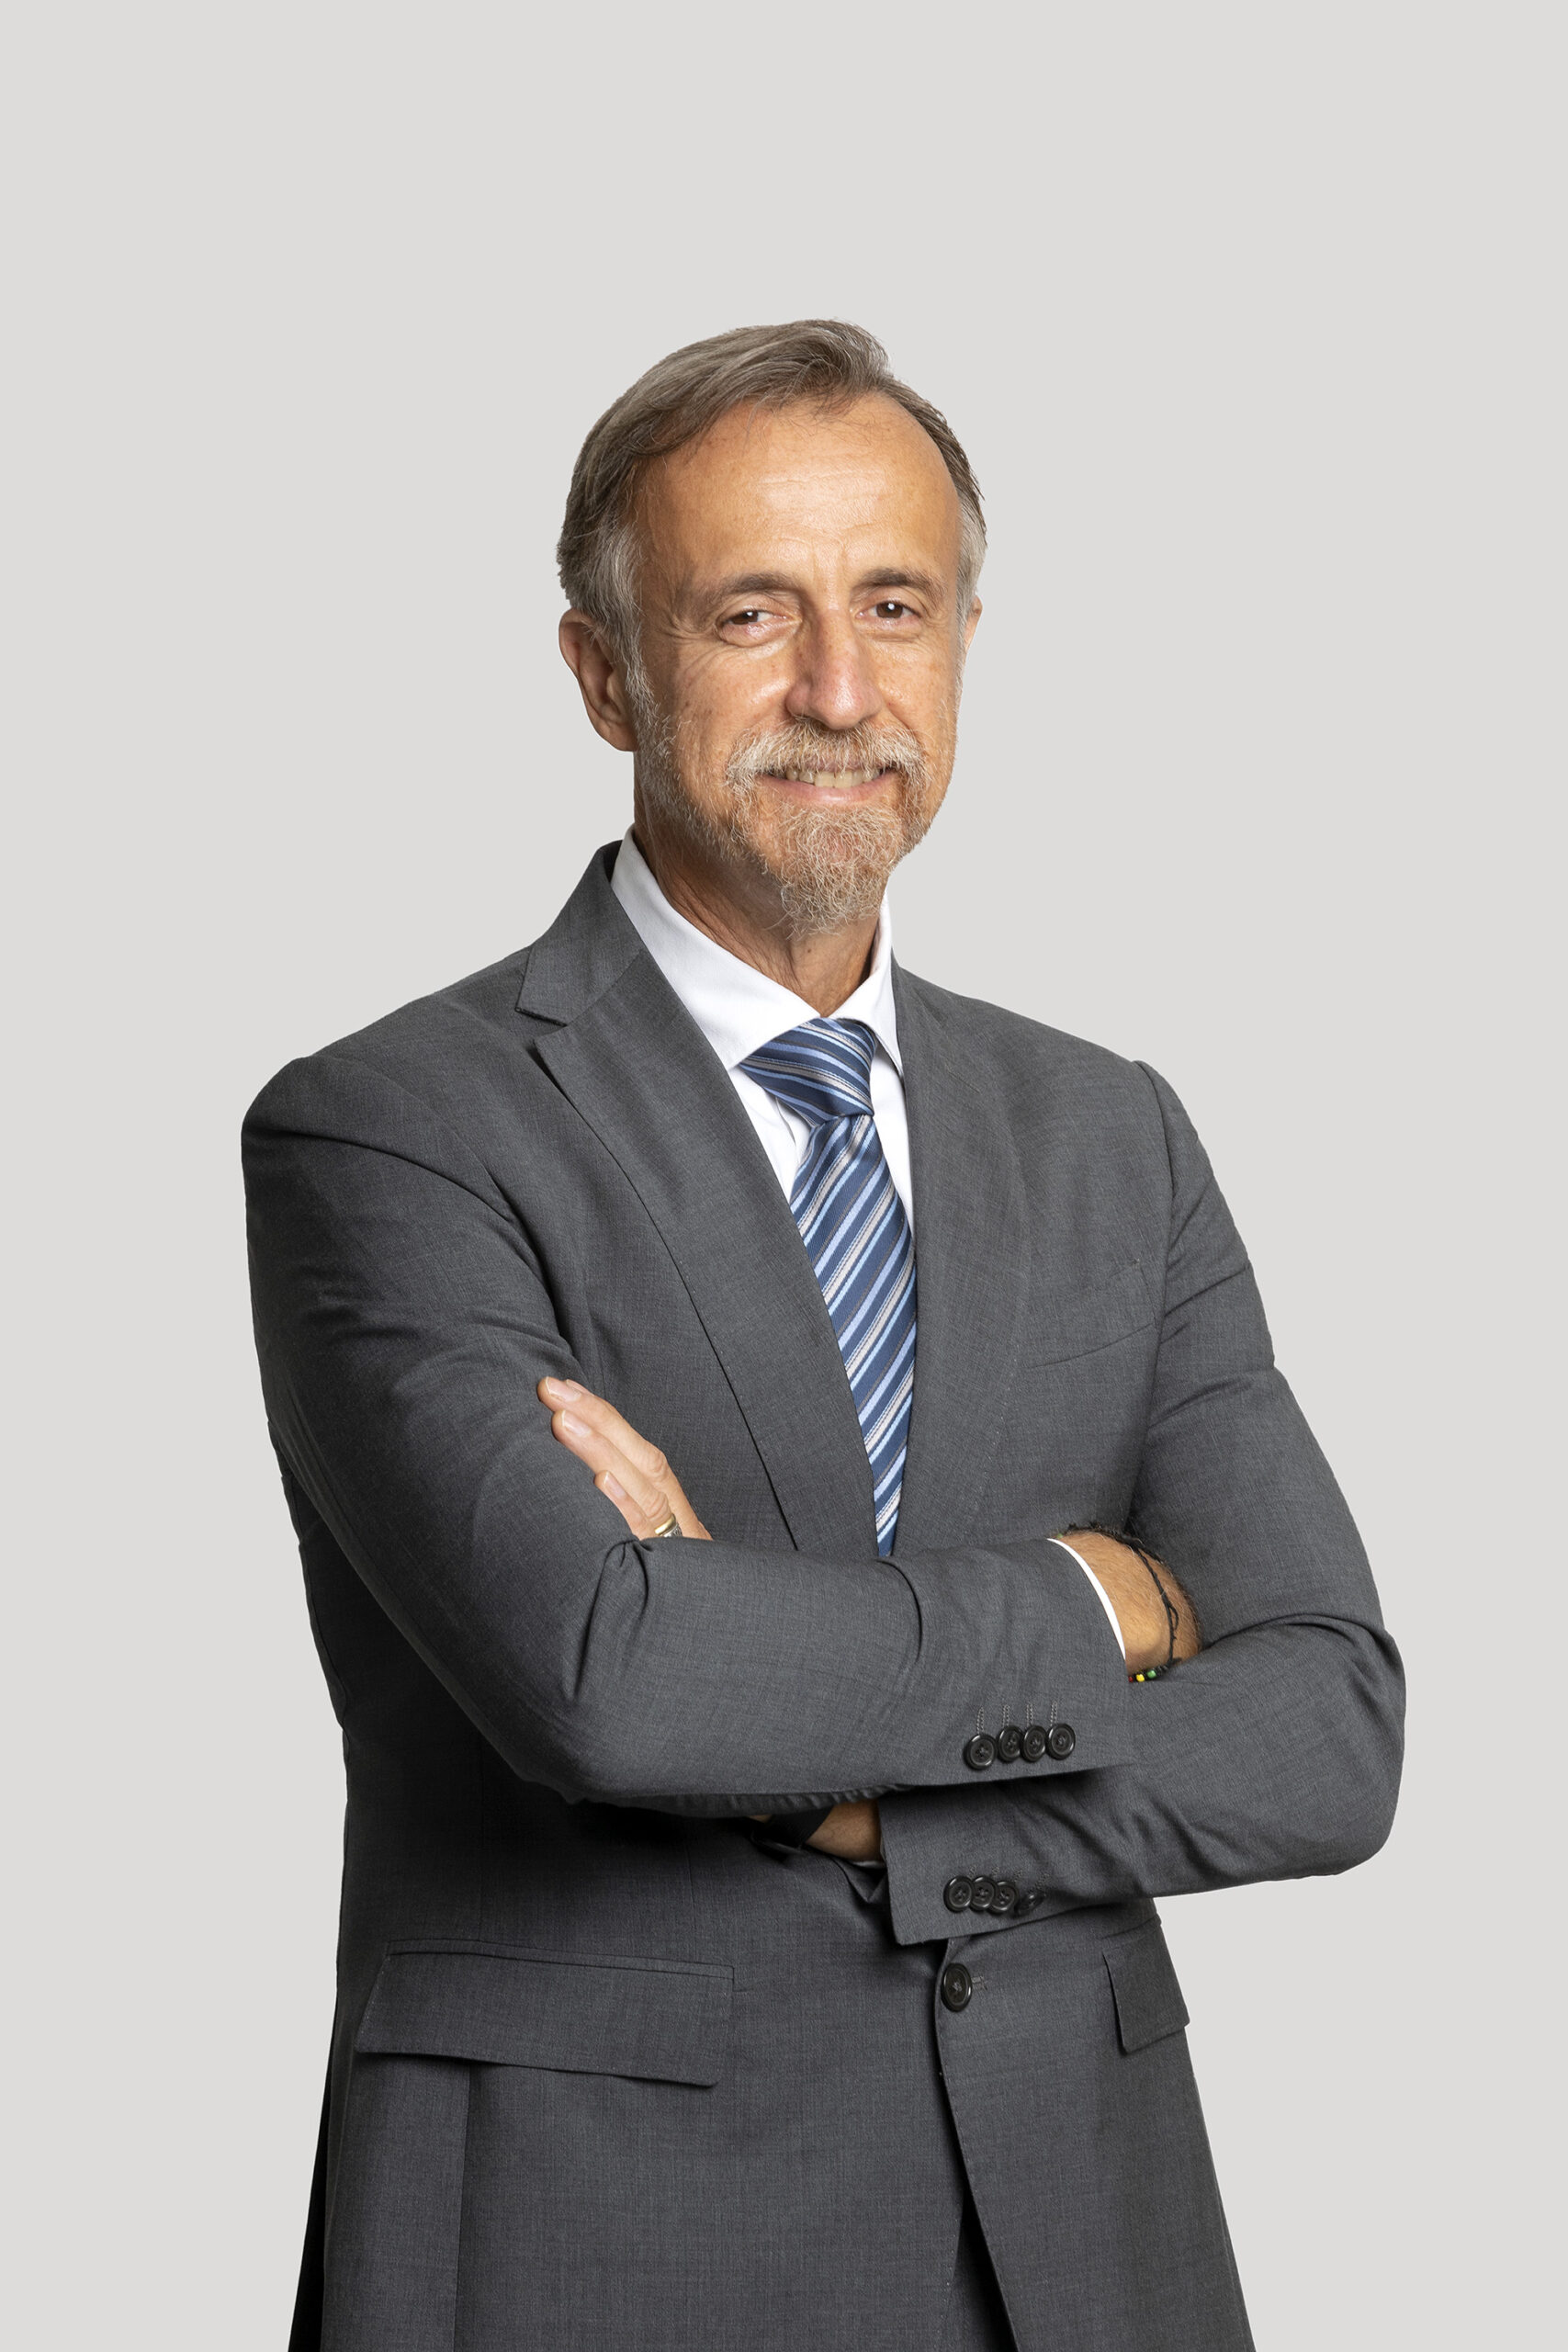 Gian Franco Baldinotti